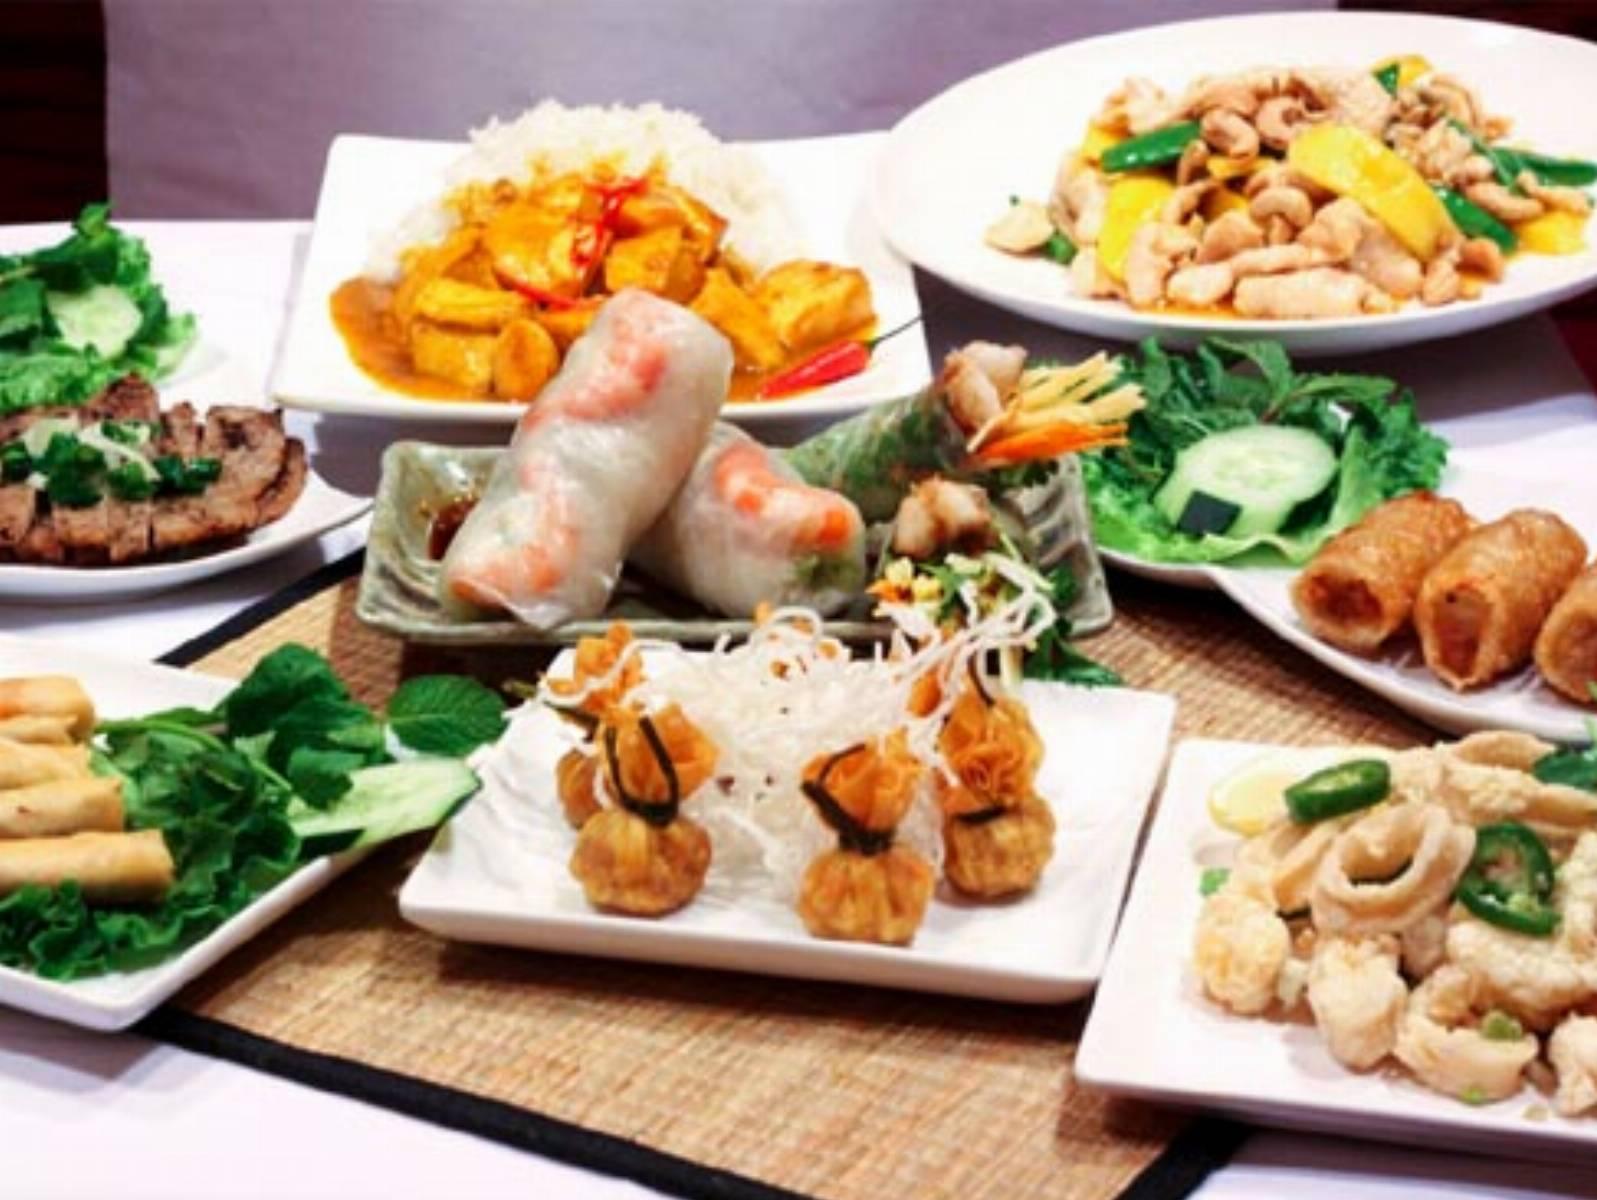 Kuchnia Wietnamska Poznaj Jej Tajniki Kobietamagpl